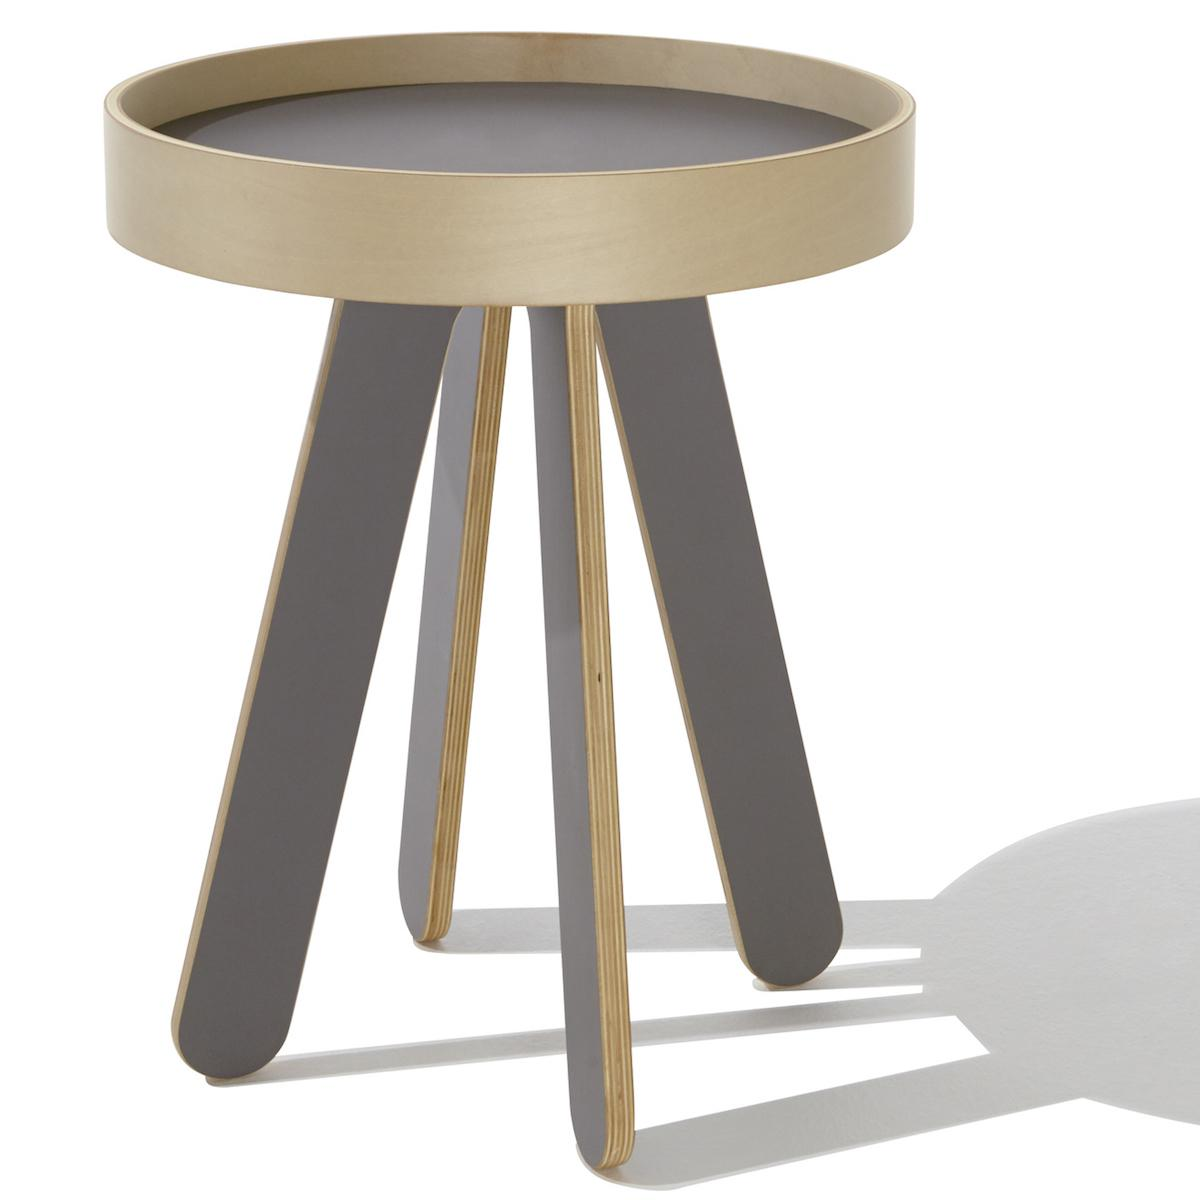 Table d'appoint-table de nuit VALET HIGH Mueller anthracite